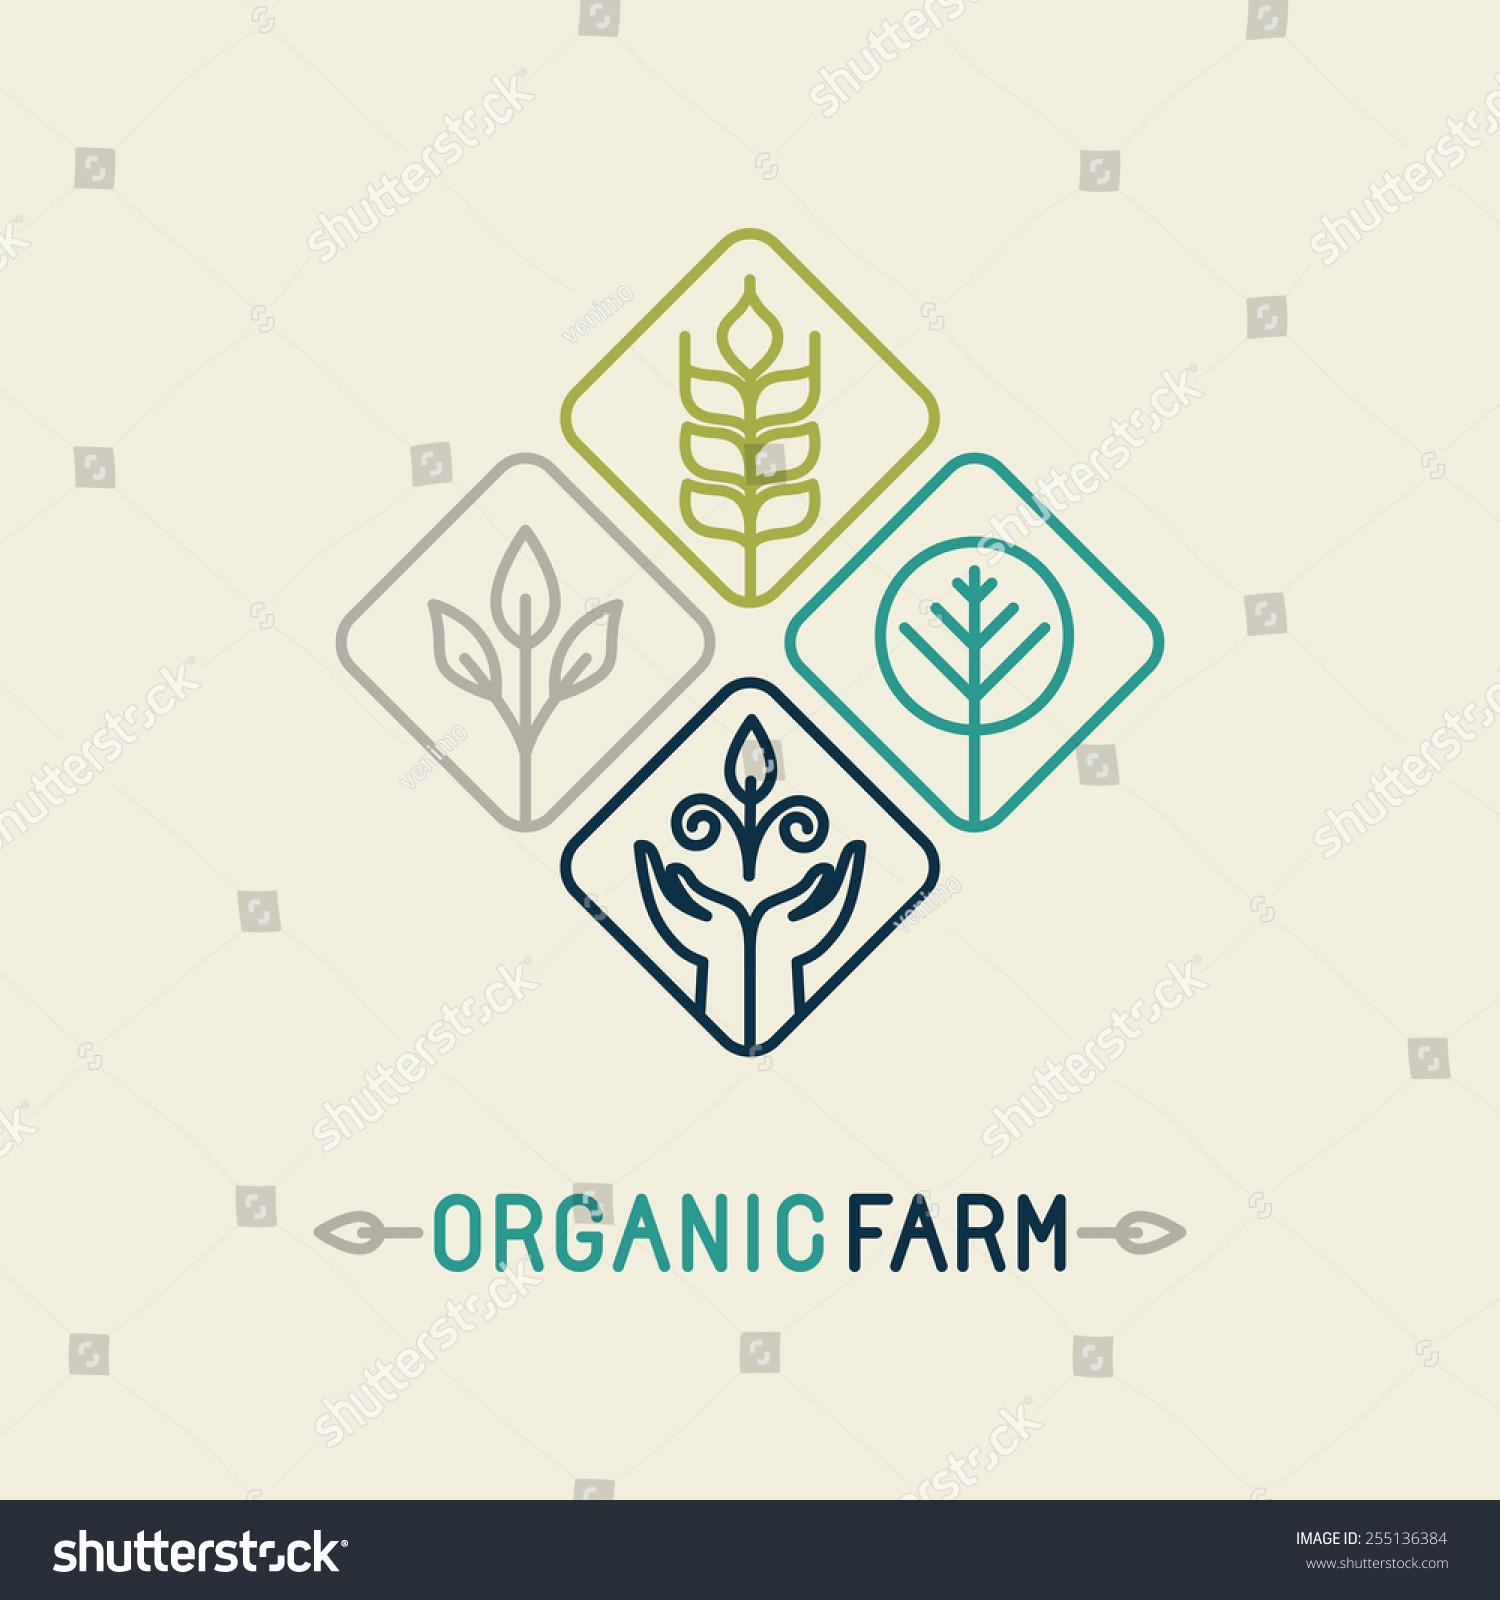 Line Logo Design : Vector agriculture organic farm line logo stock